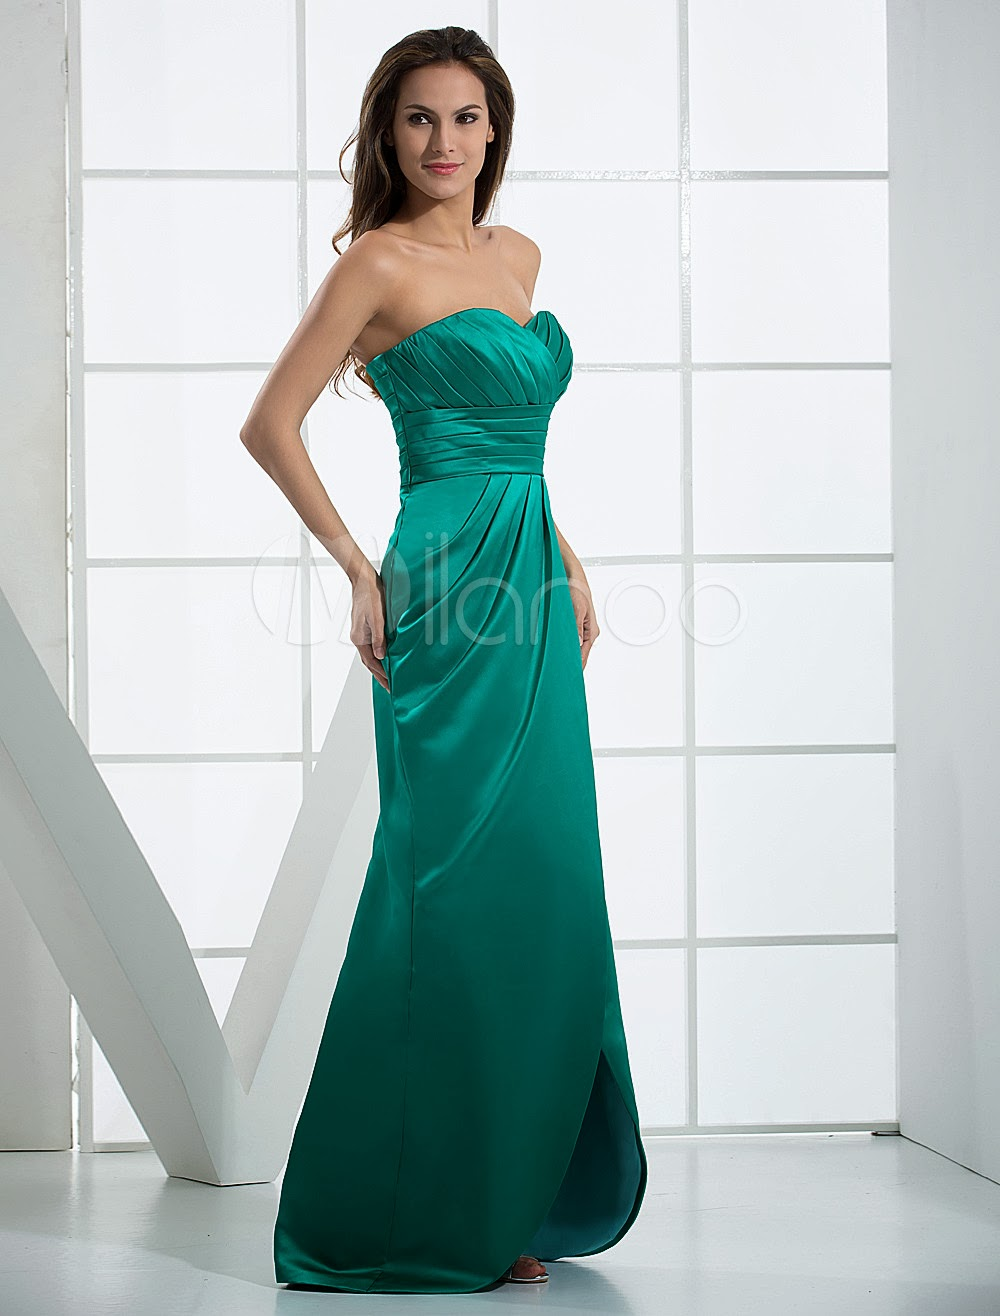 China Wholesale Dresses - Hunter Green Strapless Sweetheart Floor Length Satin Evening Dresses